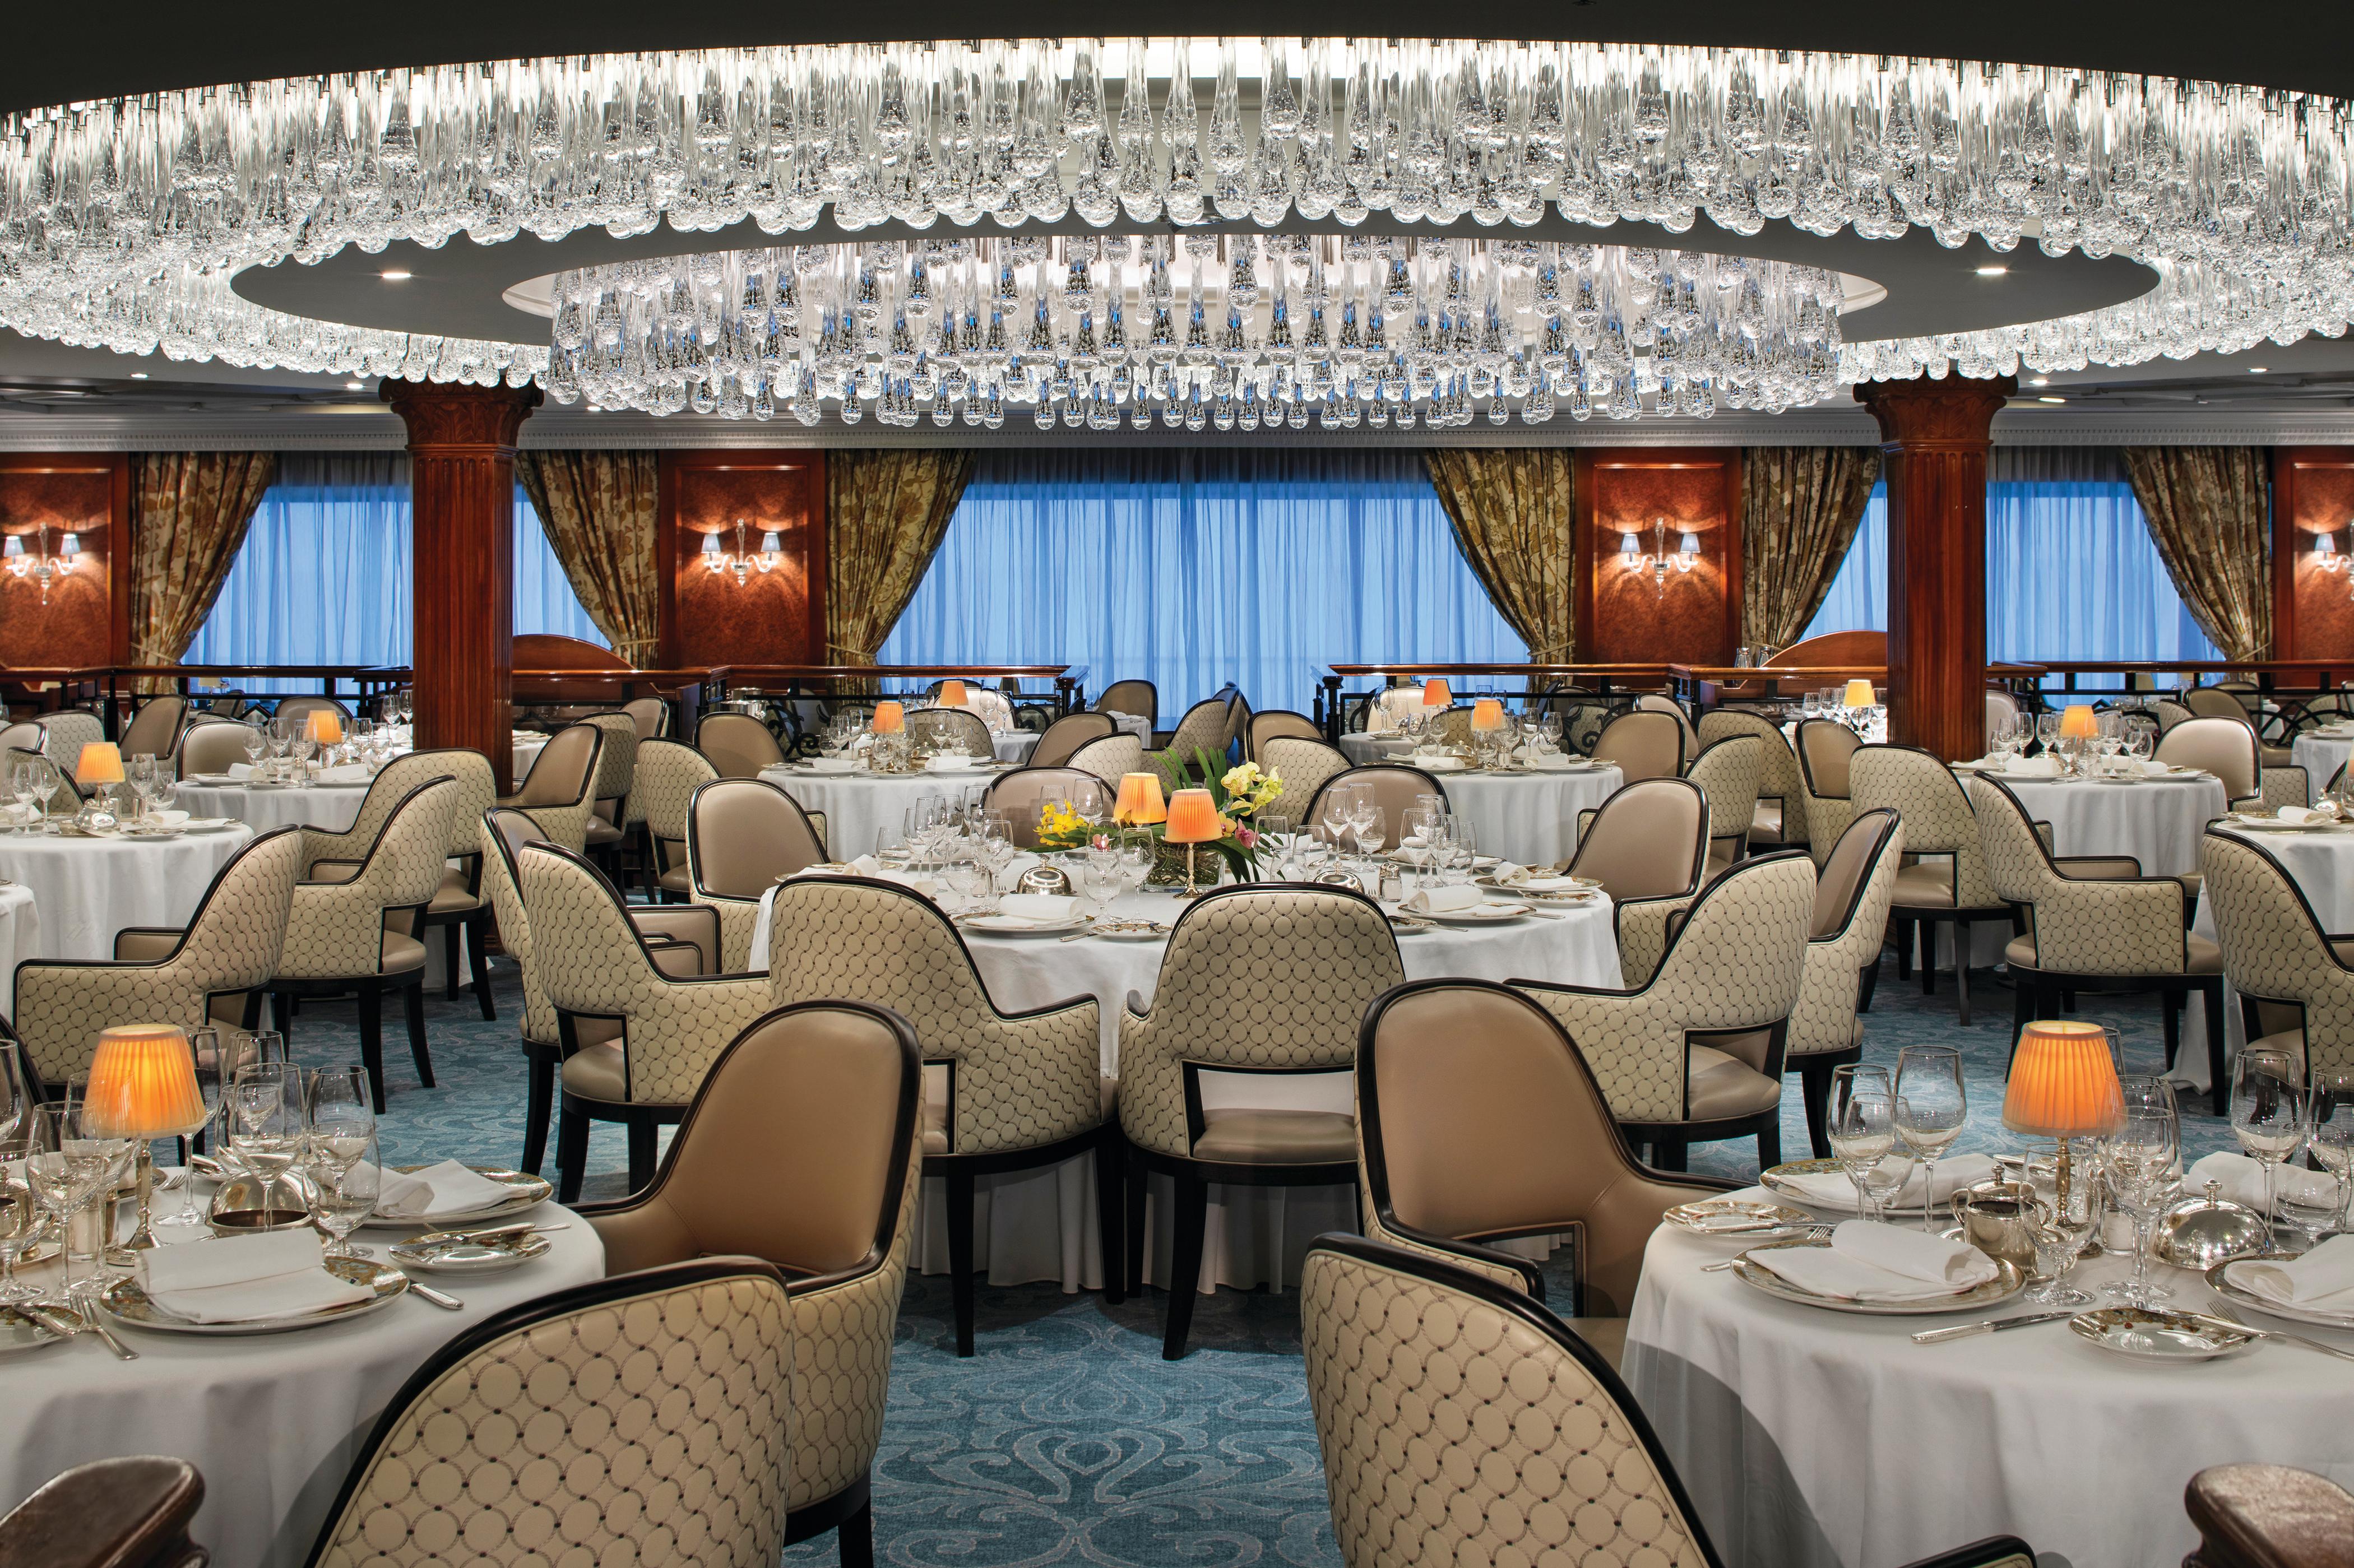 Oceania Insignia - Grand Dining Room